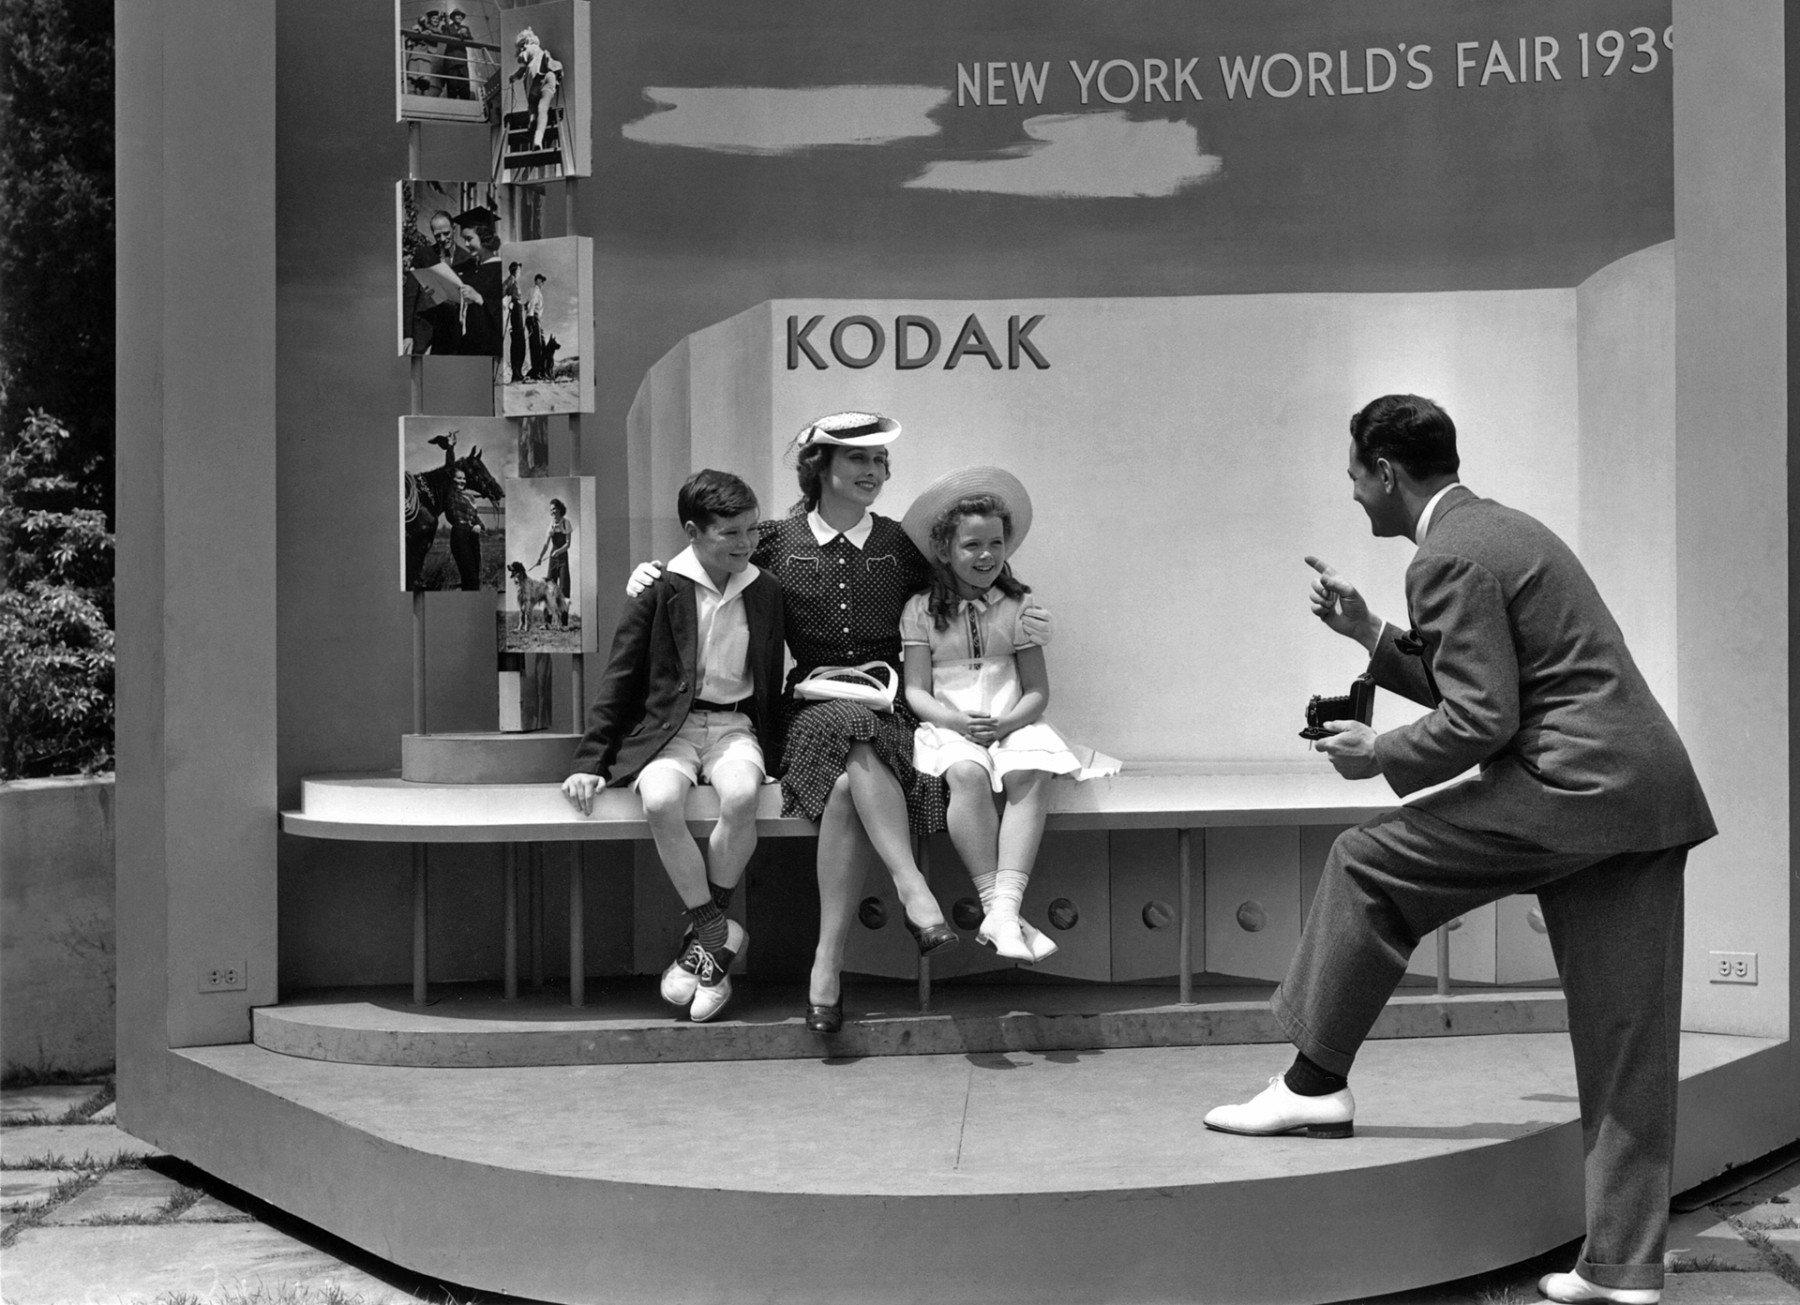 Courtesy of Kodak archive